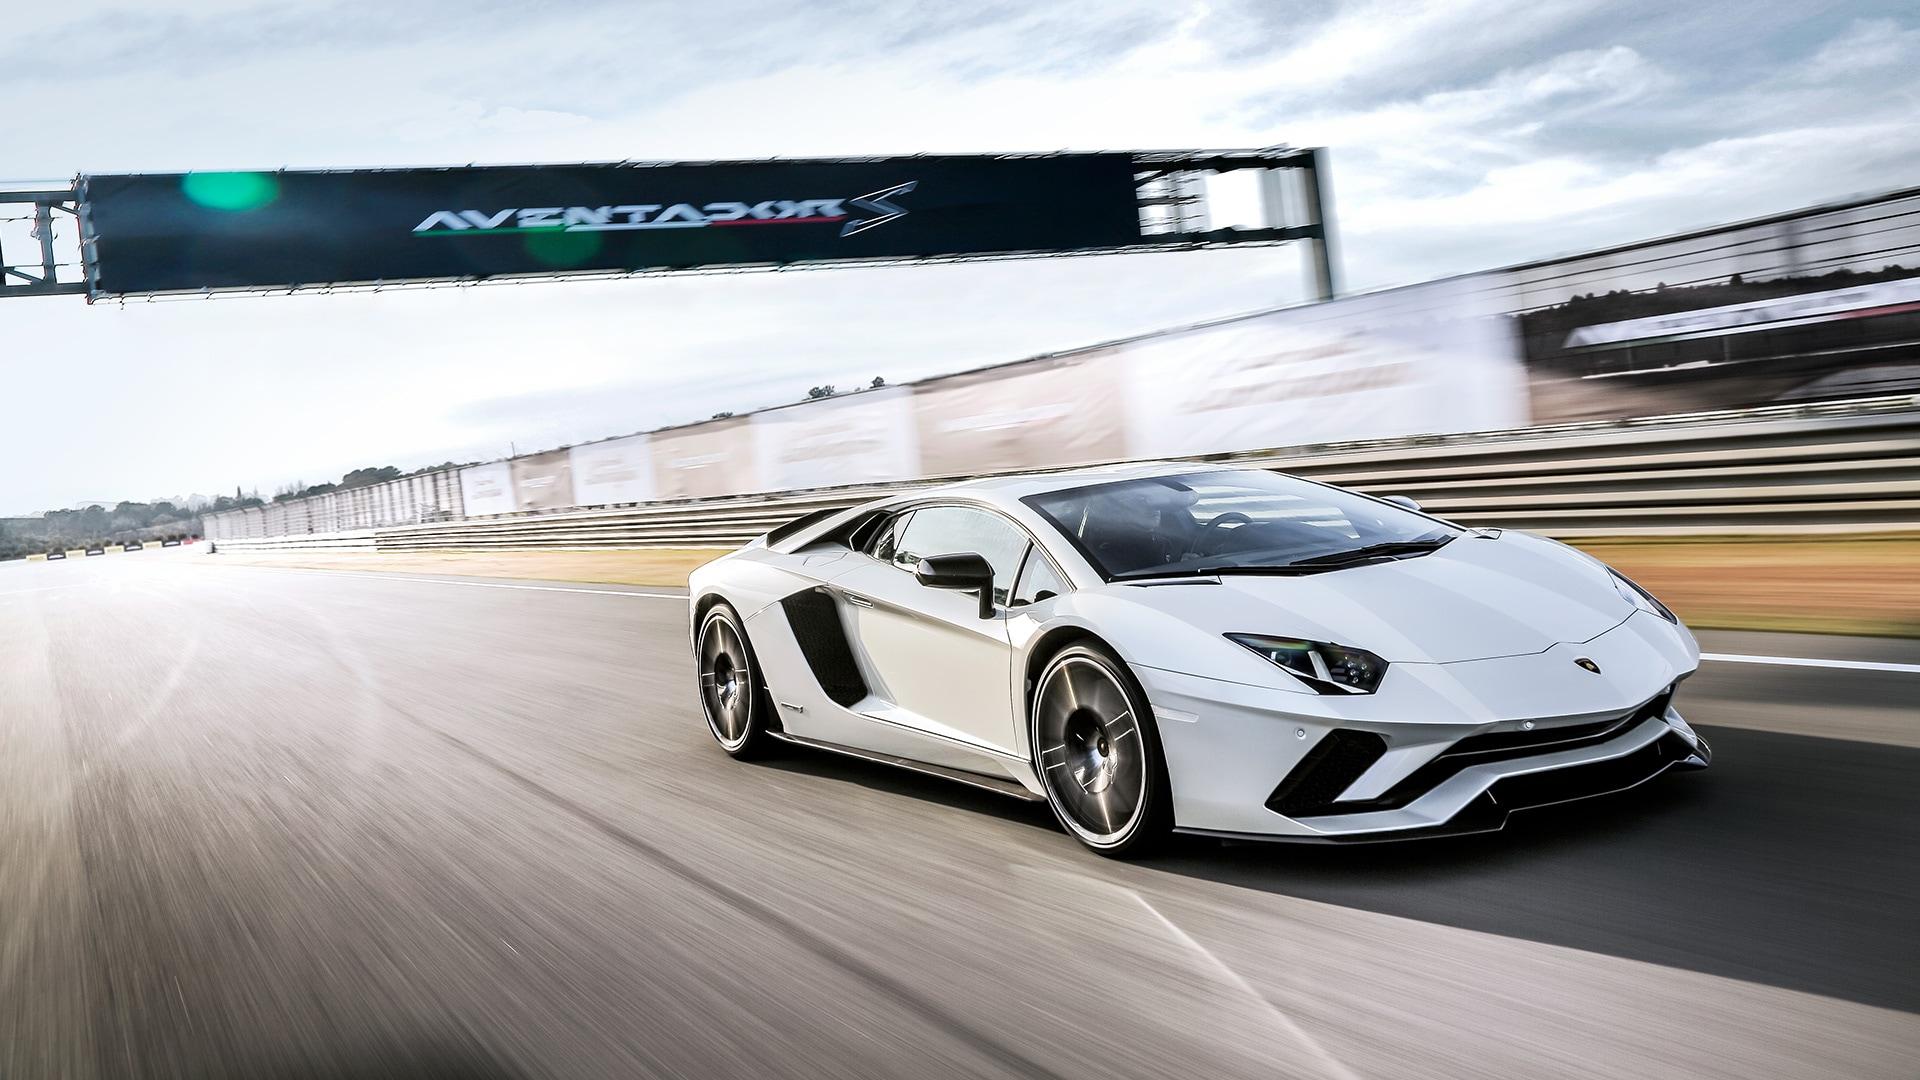 Lamborghini Aventador S Fotos Videos